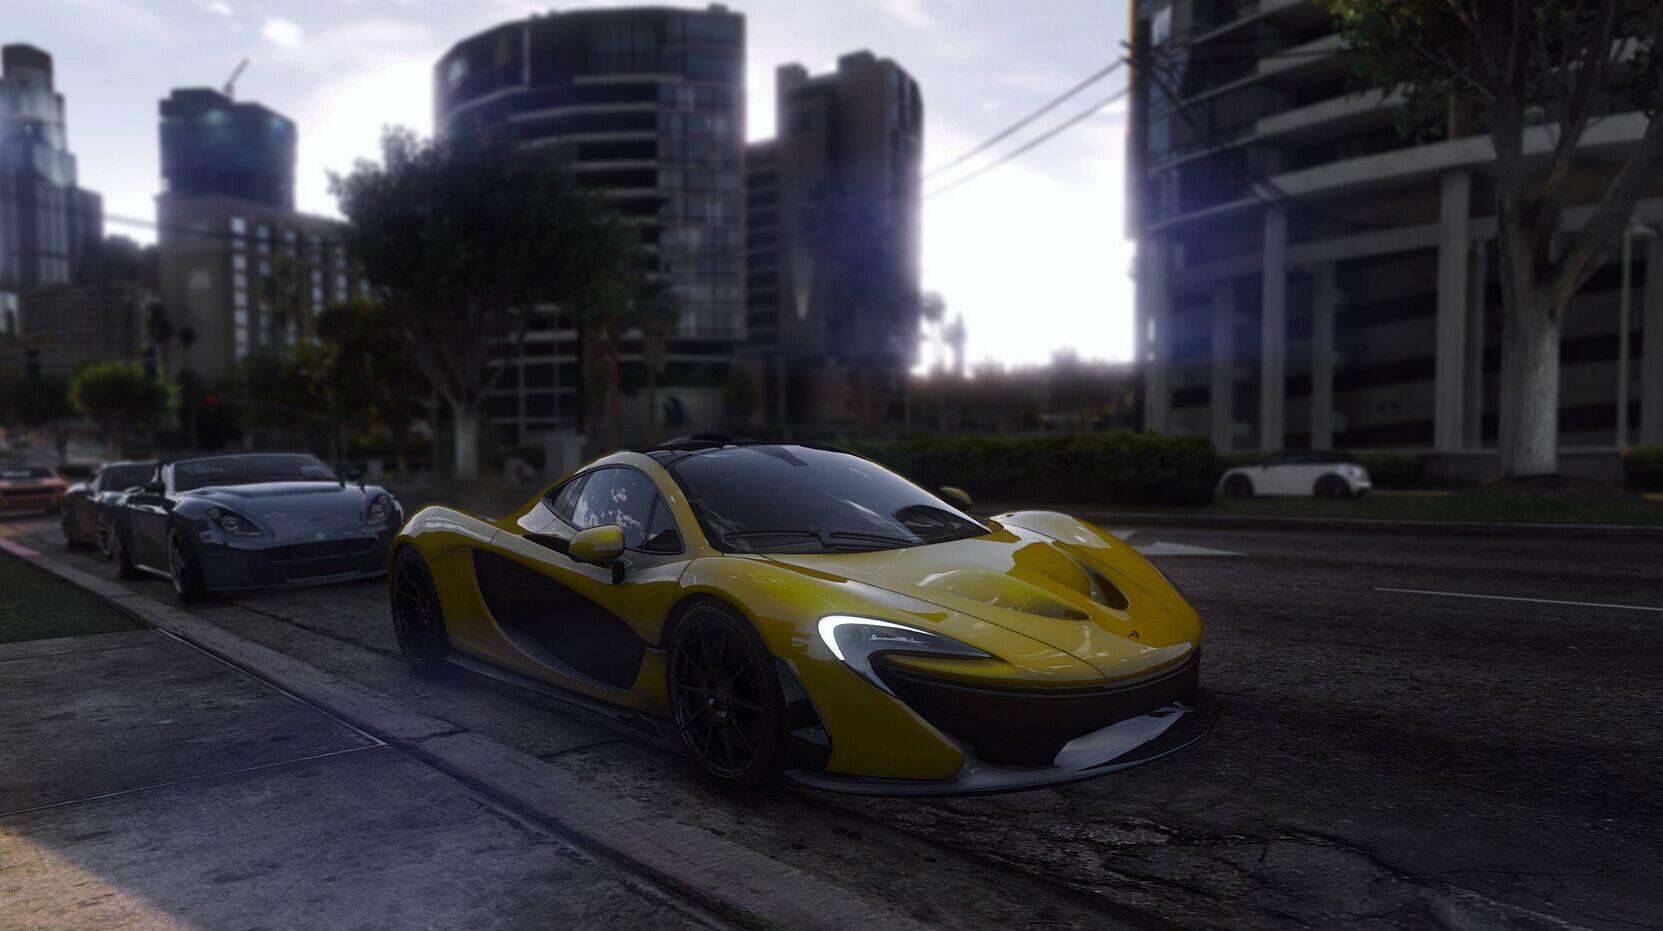 《GTA5》ENB Mod:4K分辨率打造视觉盛宴